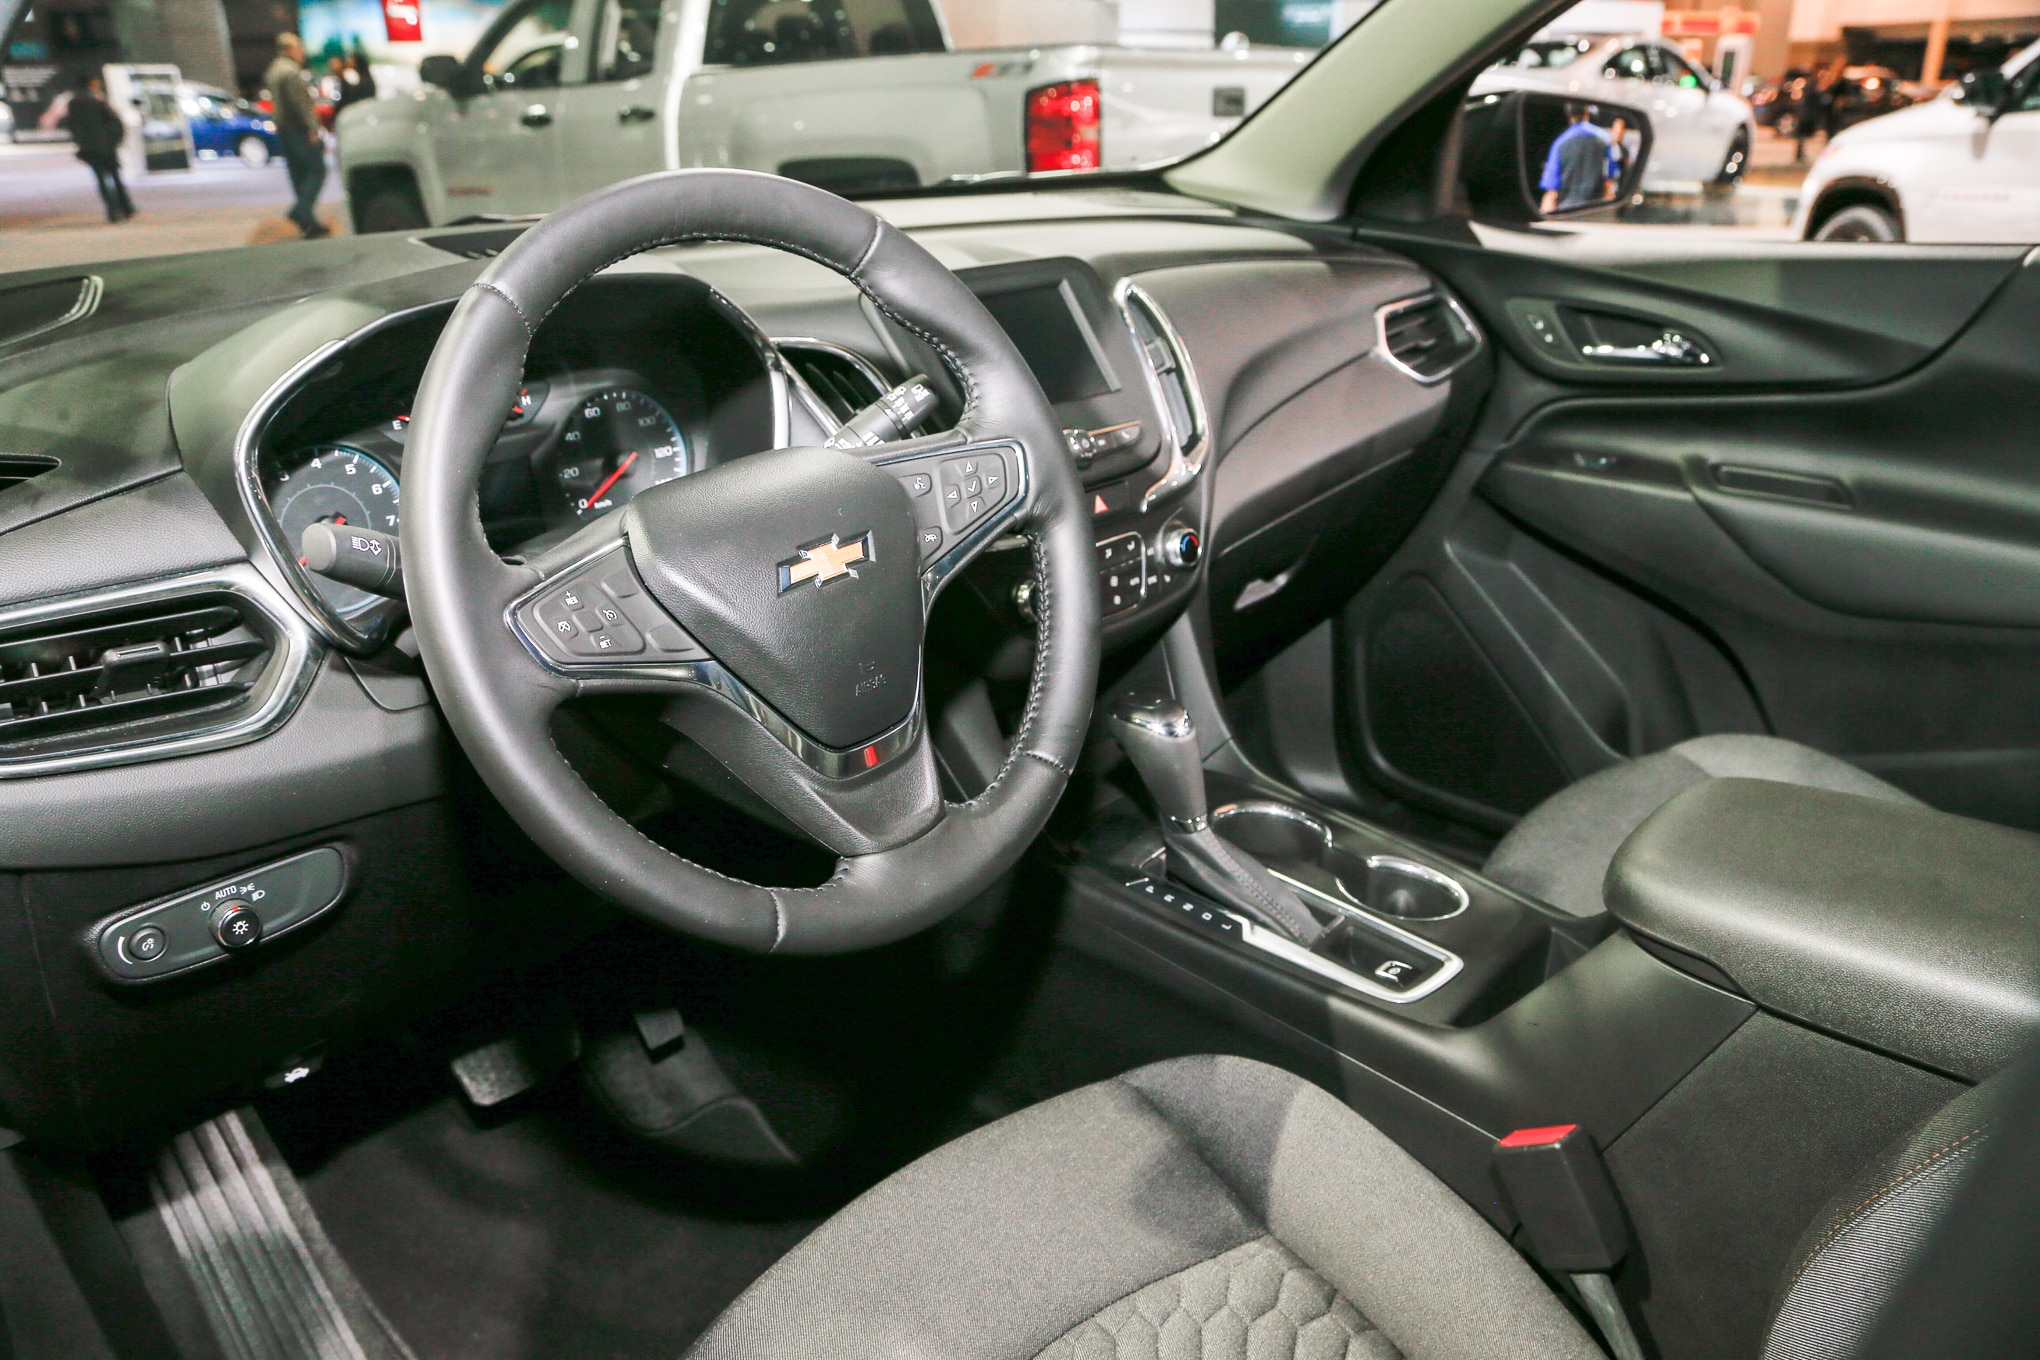 2017 Silverado Colors >> Chevrolet Adds Redline Edition to 13 Vehicles | Automobile ...